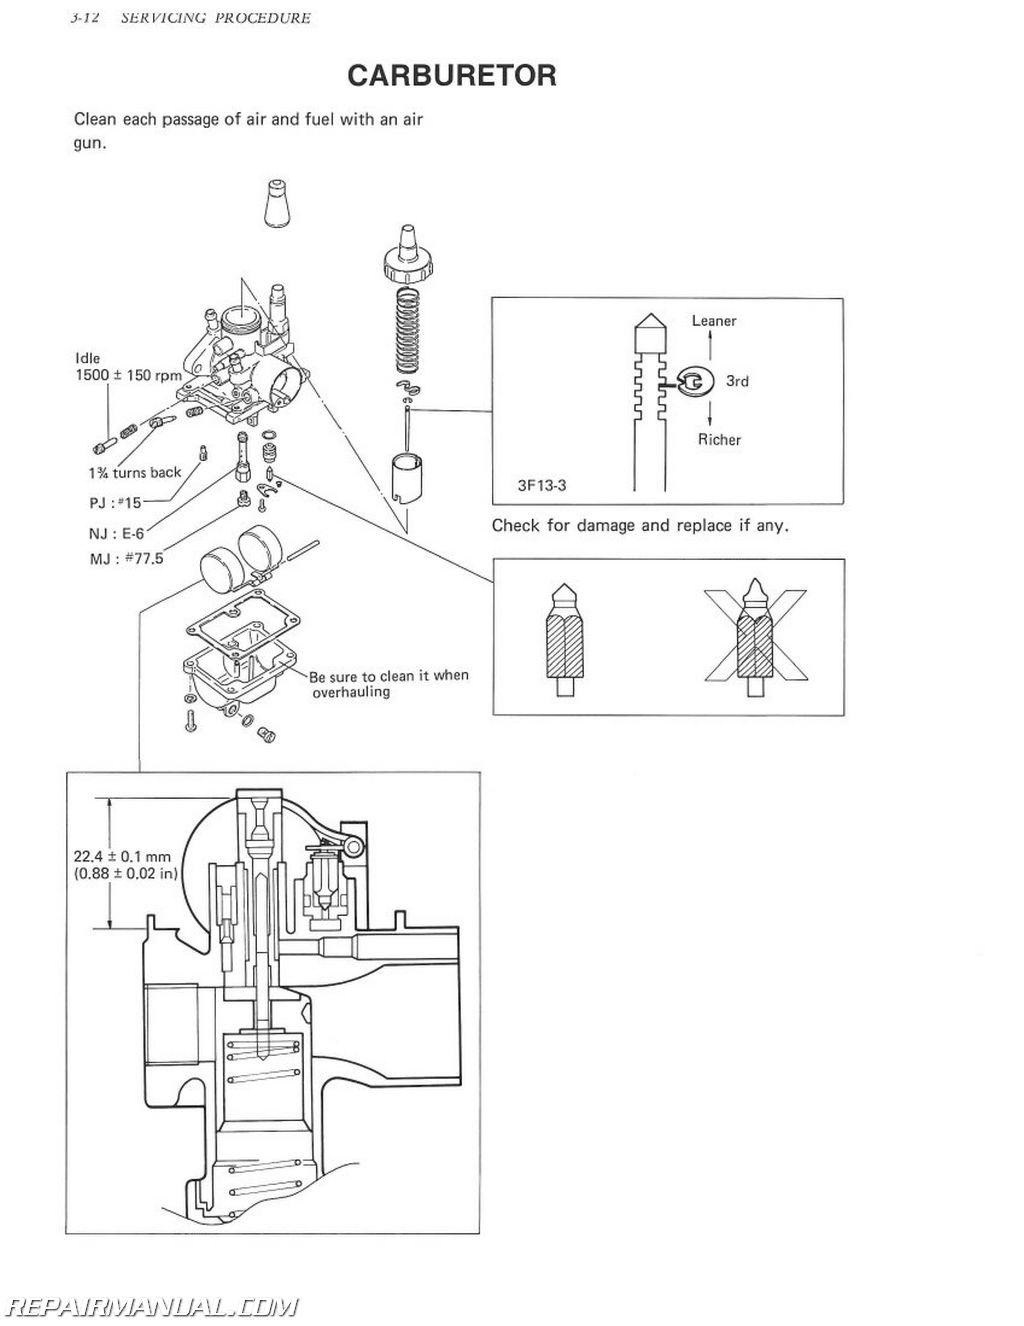 hight resolution of suzuki fa50 wiring diagram wiring diagram 1980 suzuki fa50 wiring diagram wiring library1980 1991 suzuki fa50